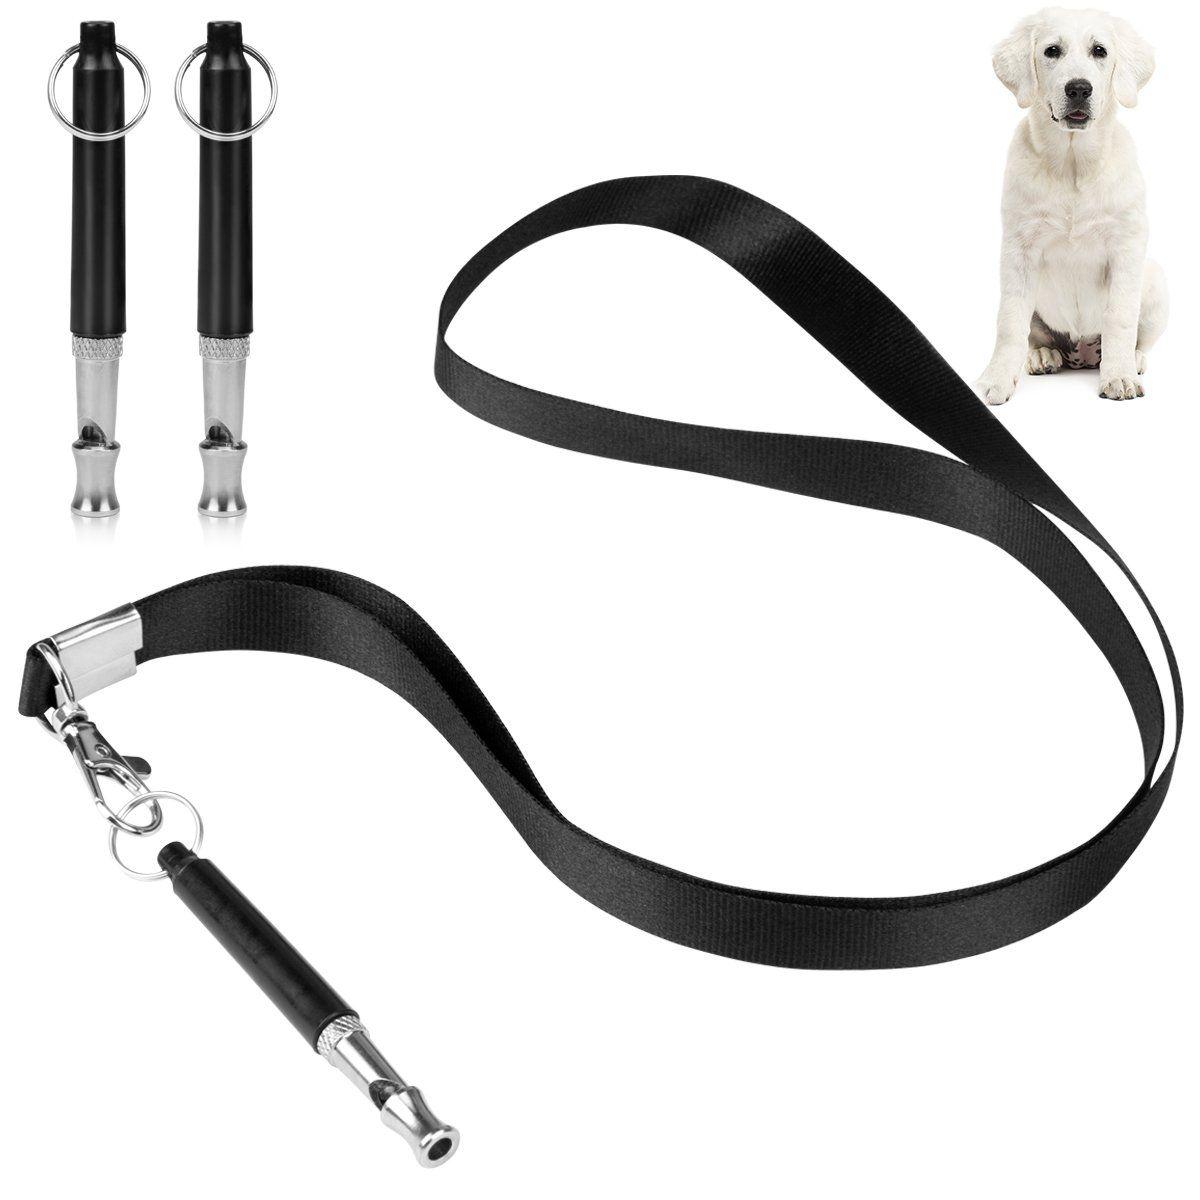 Amariver Black Dog Training Whistles With Lanyard Strap 3 Pack